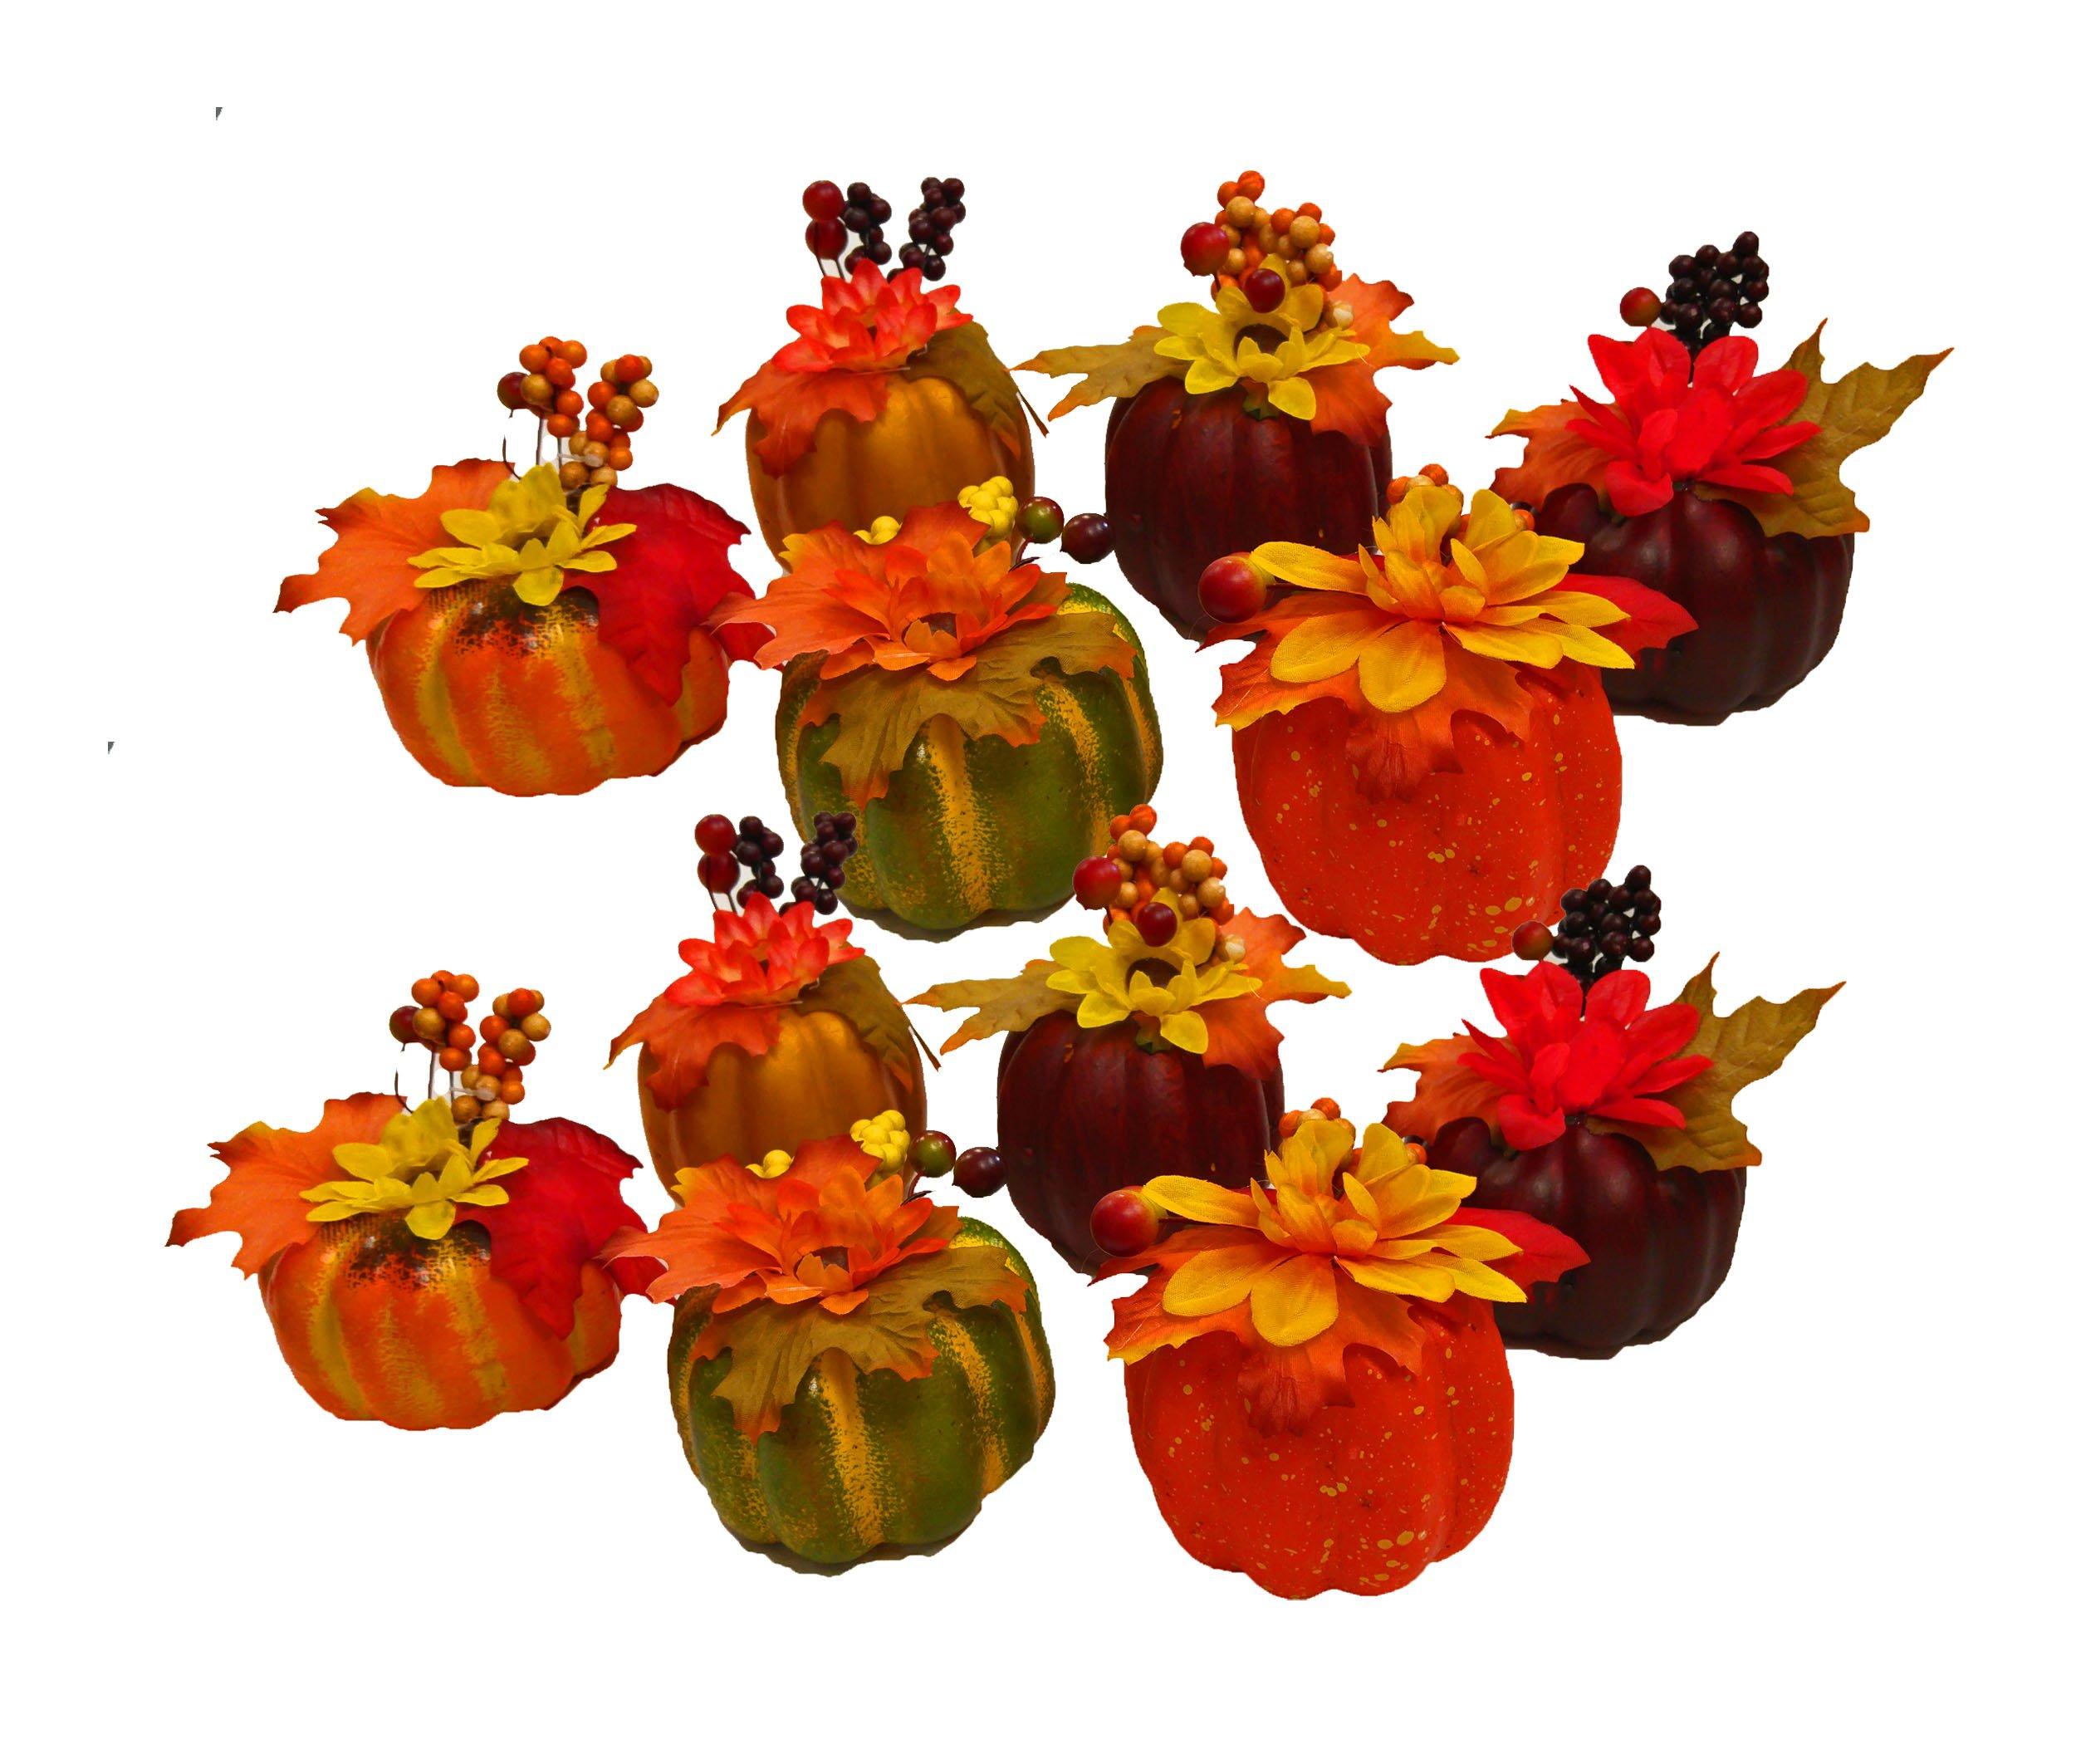 Black Duck Brand Set of 12 Artificial Decorative Harvest 4'' Pumpkins/Gourds Fall Halloween Decorations (Set of 12) by Black Duck Brand